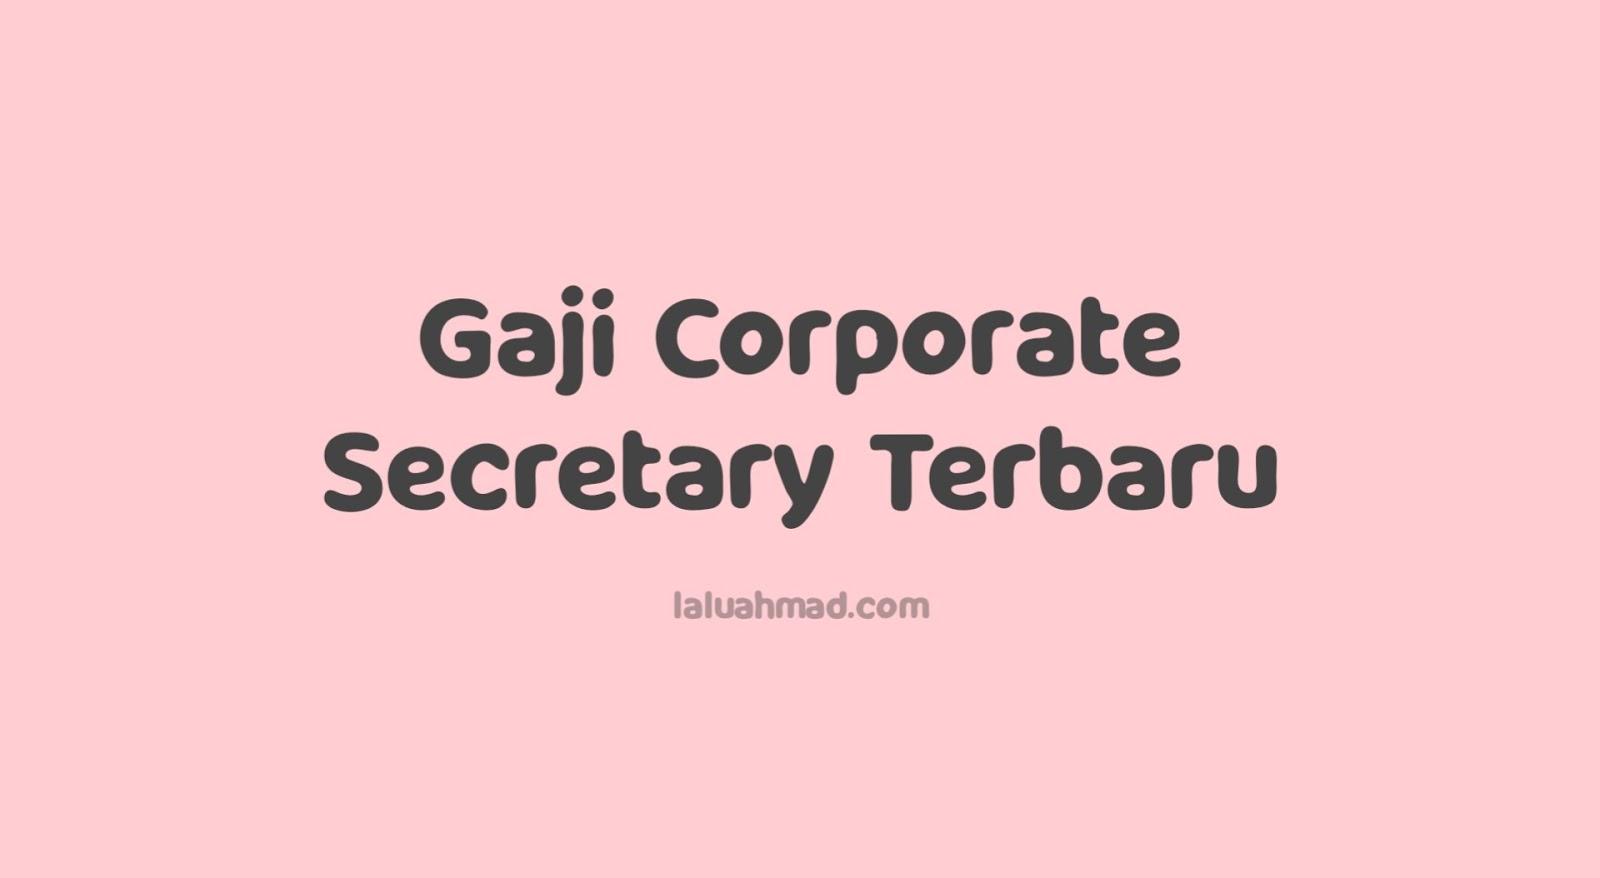 Gaji Corporate Secretary Terbaru